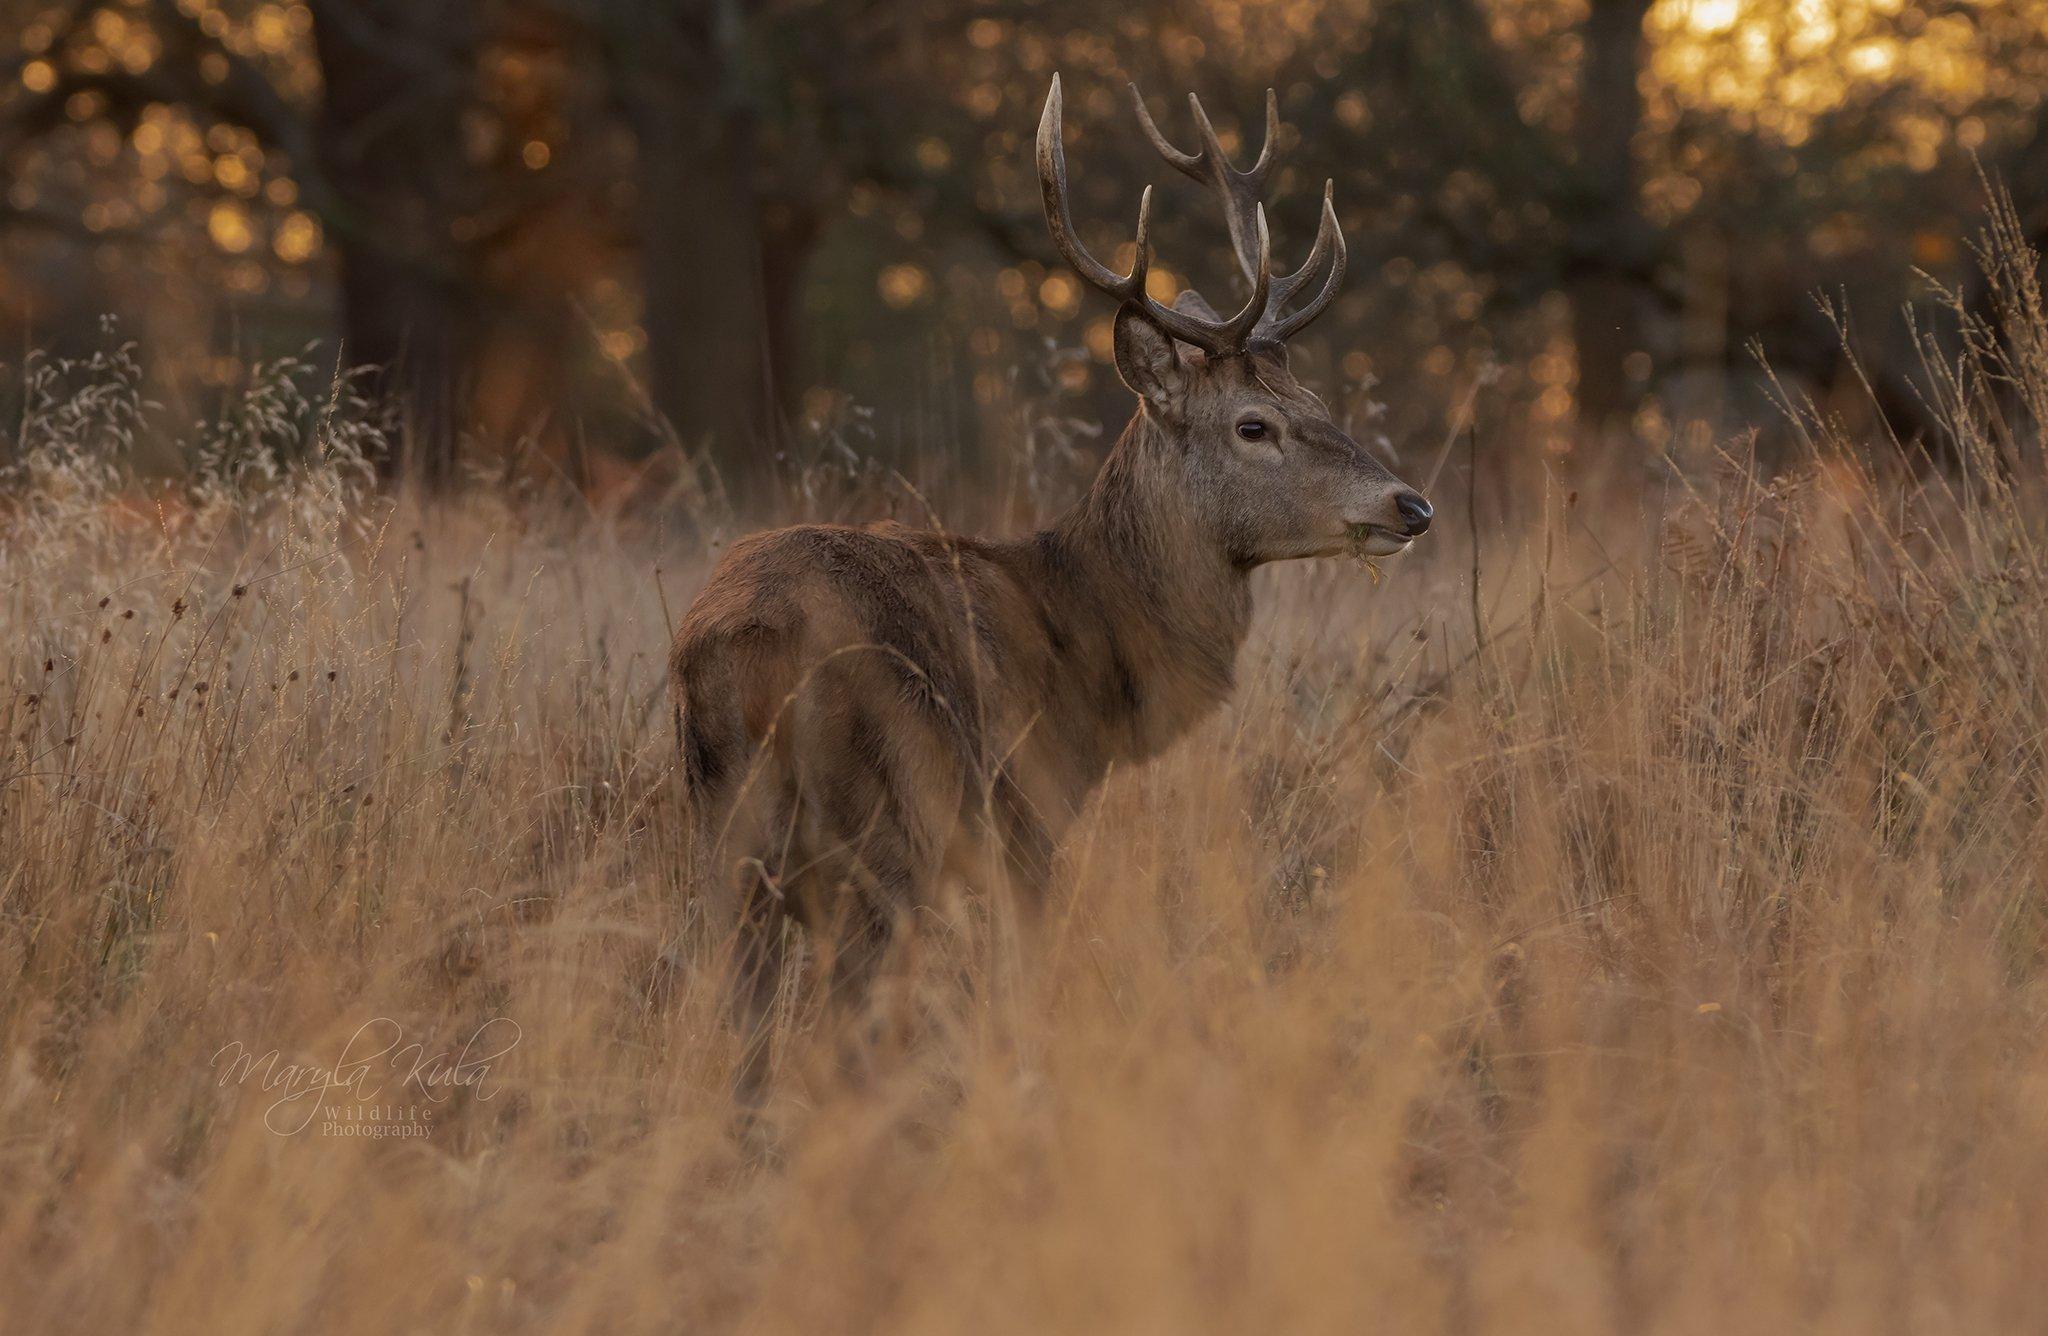 red deer, deer, nature, wildlife, woods, bracken, sunset, MARIA KULA